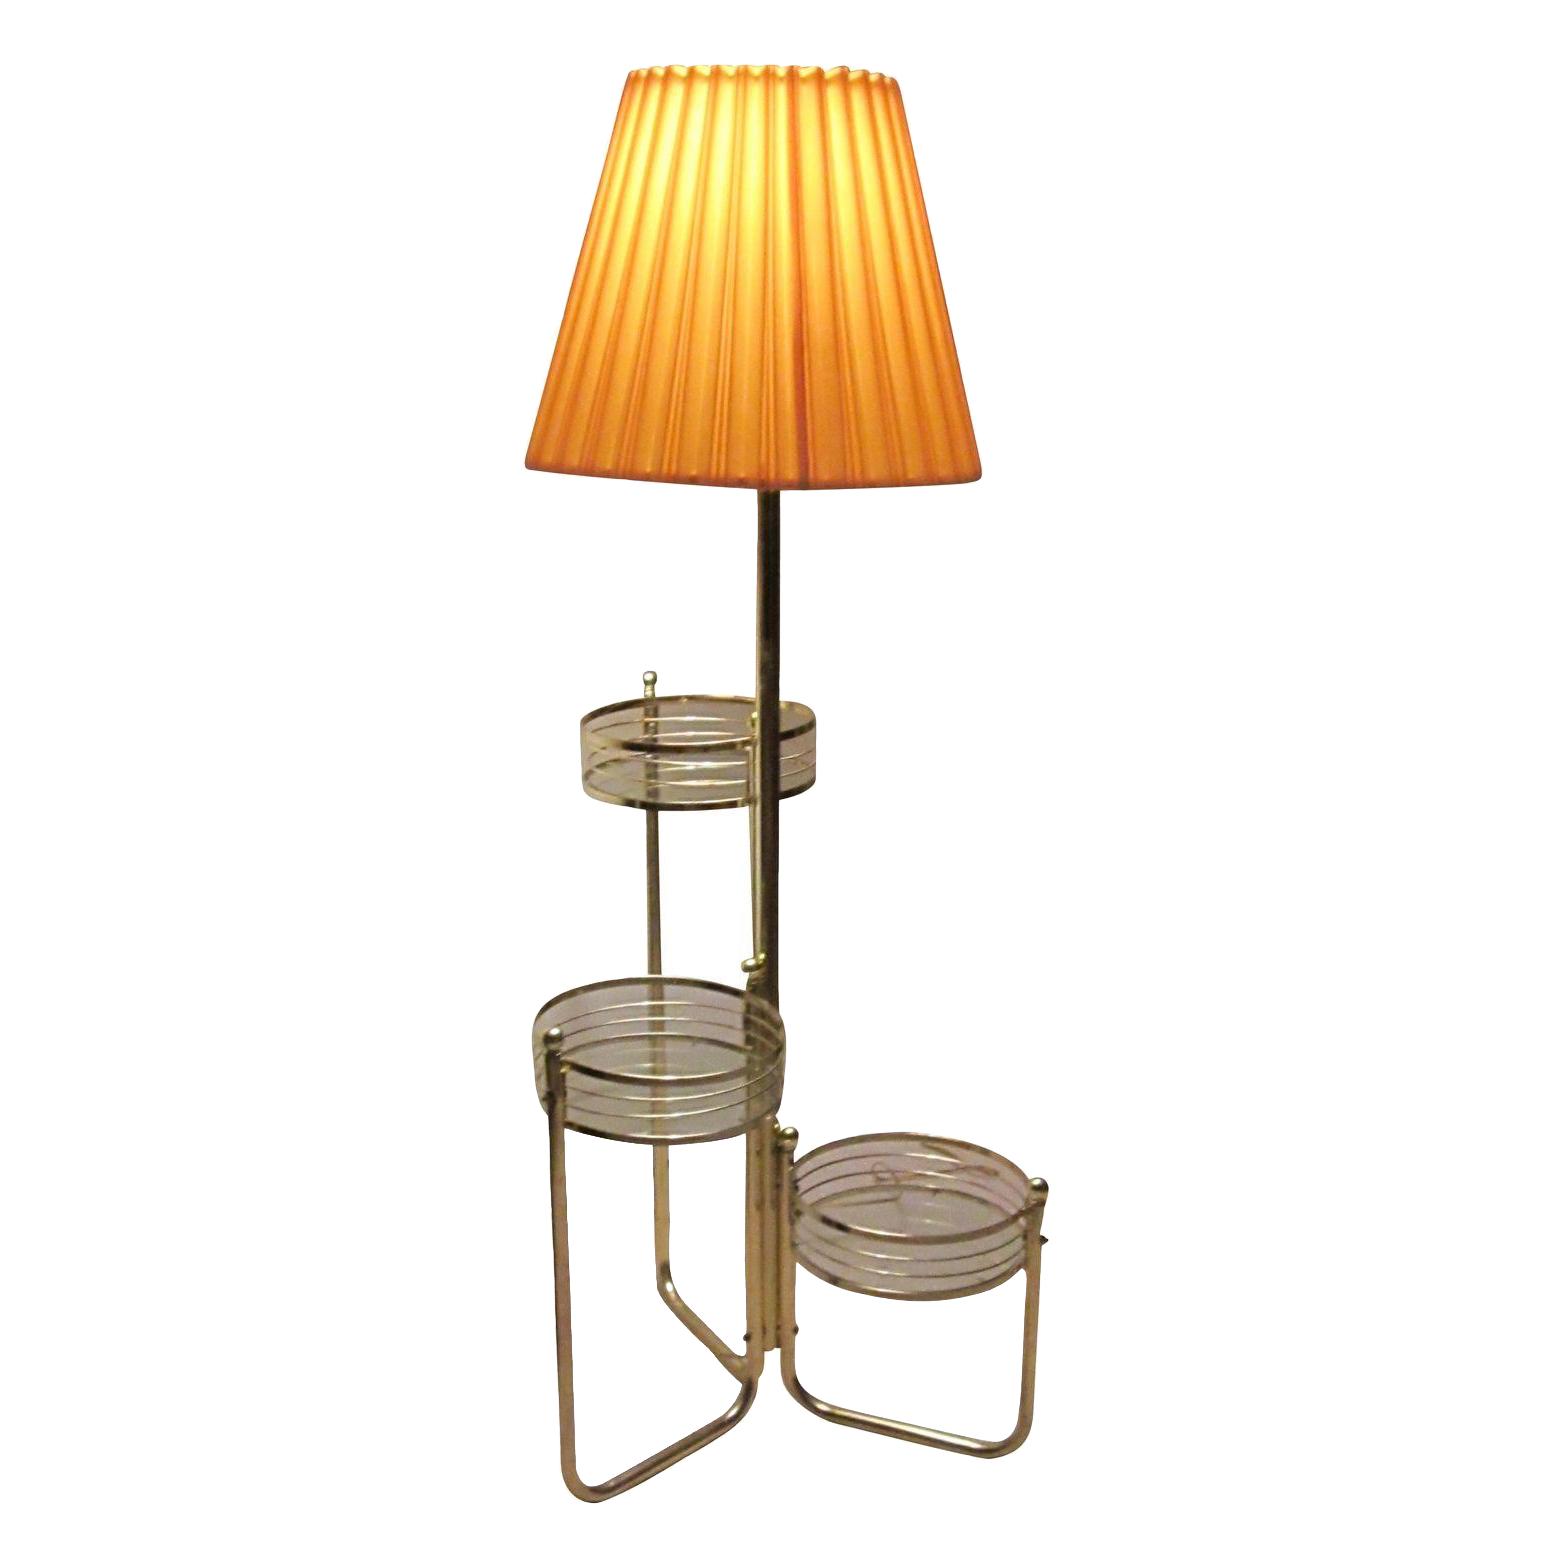 vintage brass glass tiered shelf floor lamp chairish With tiered shelf floor lamp